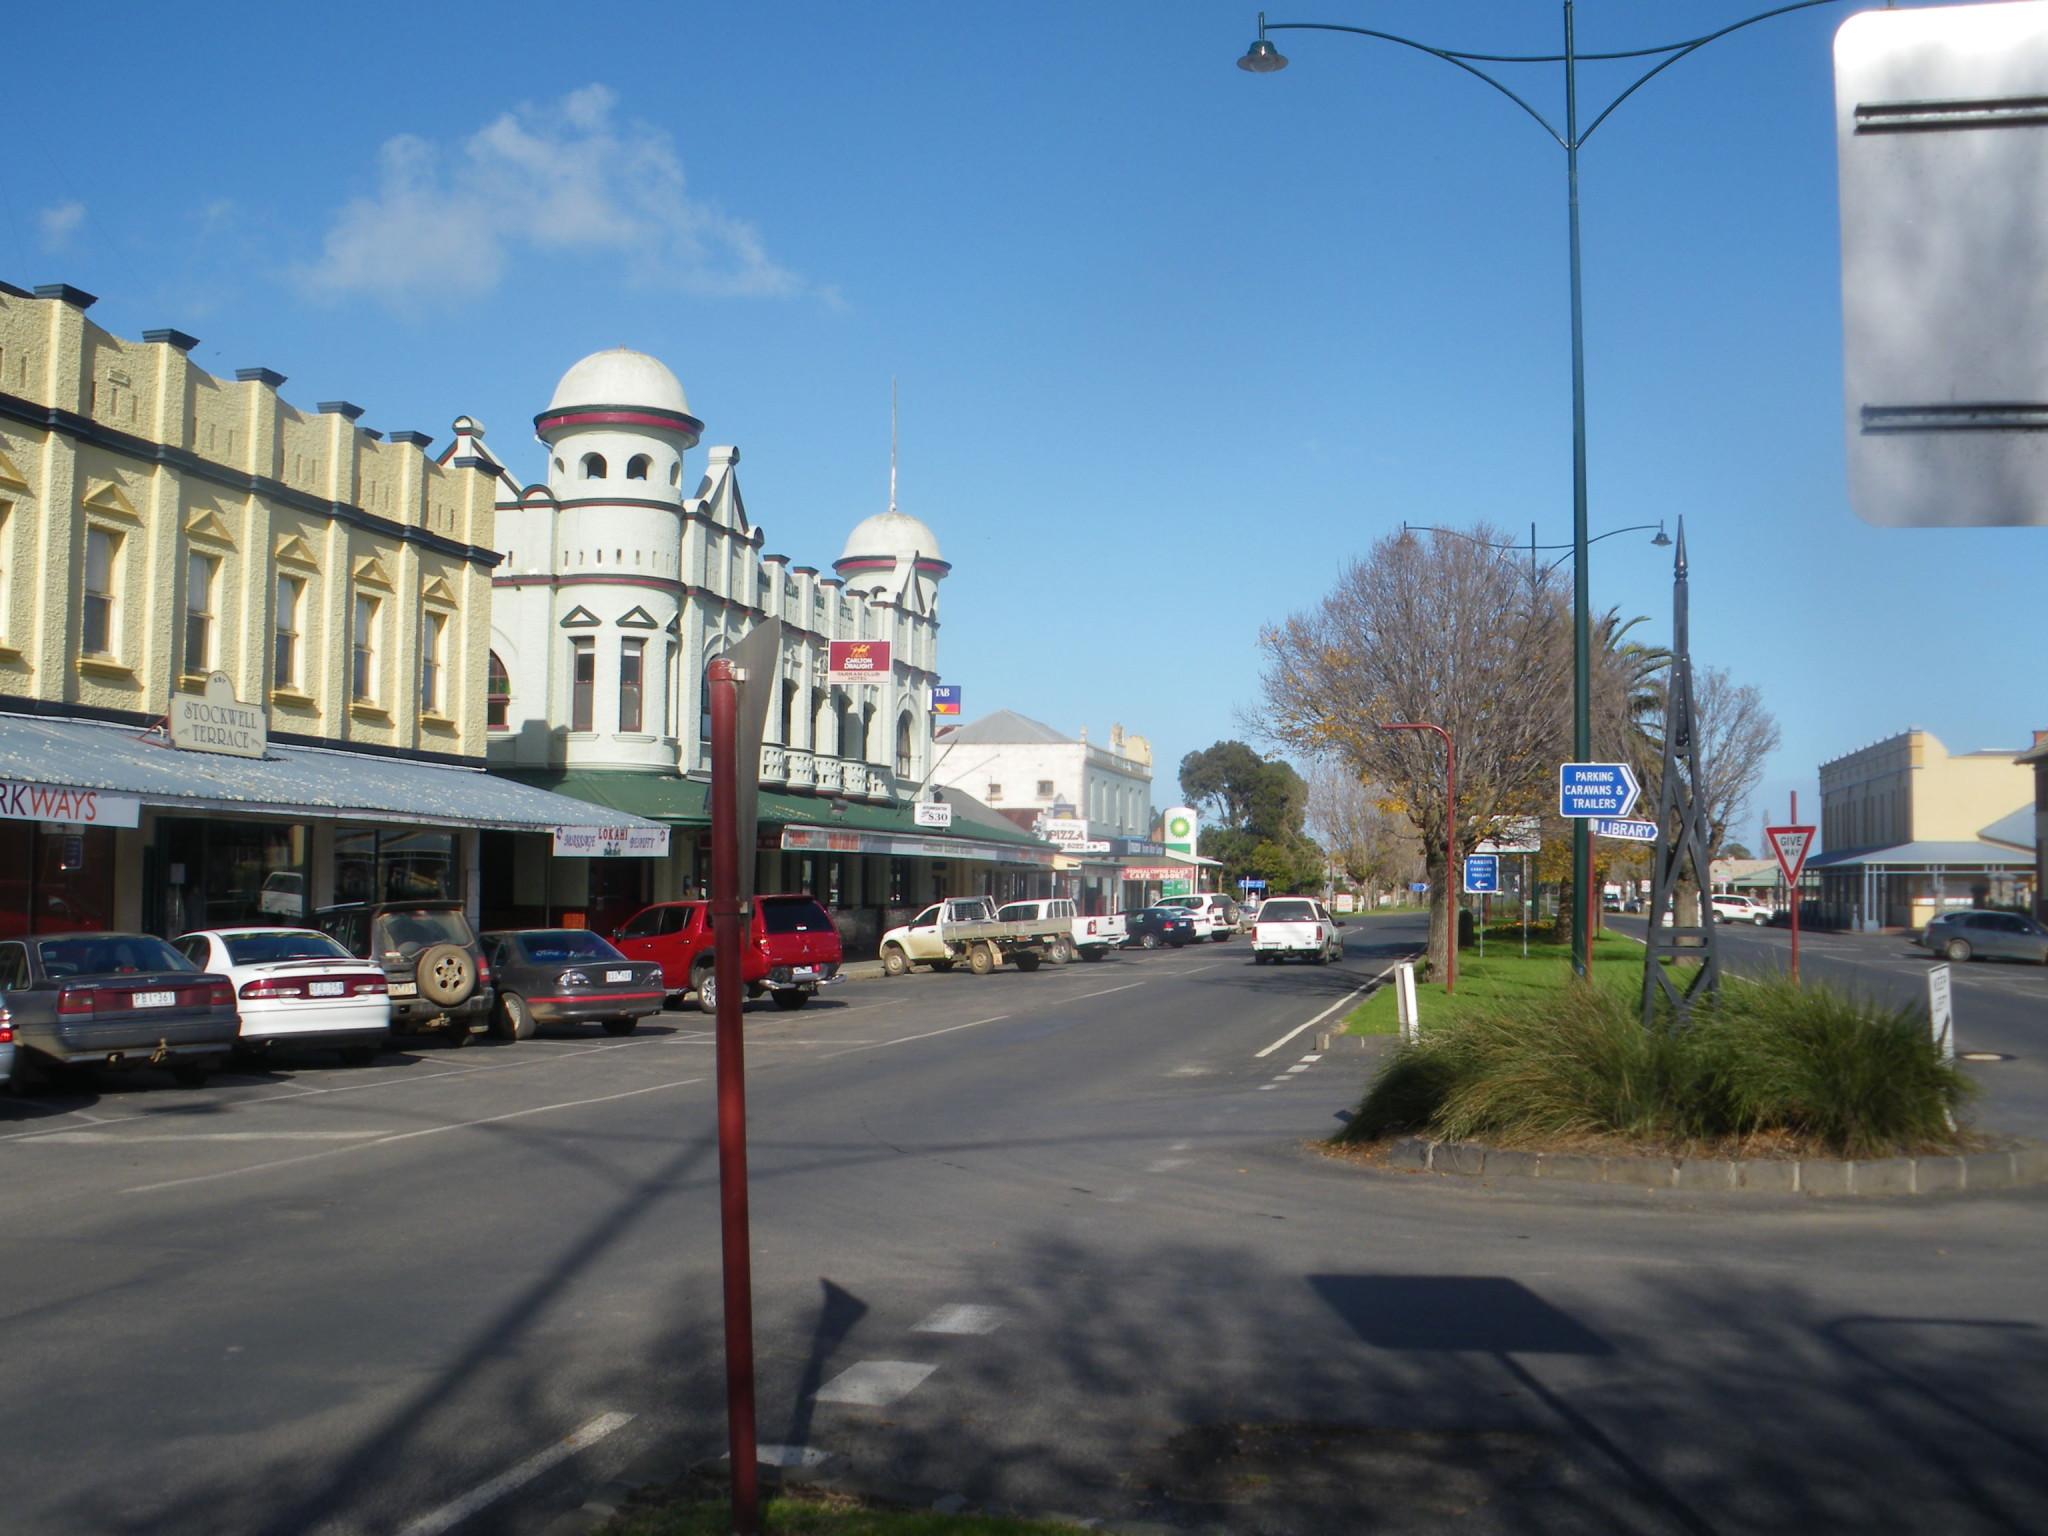 Backpacking in Yarram Australia